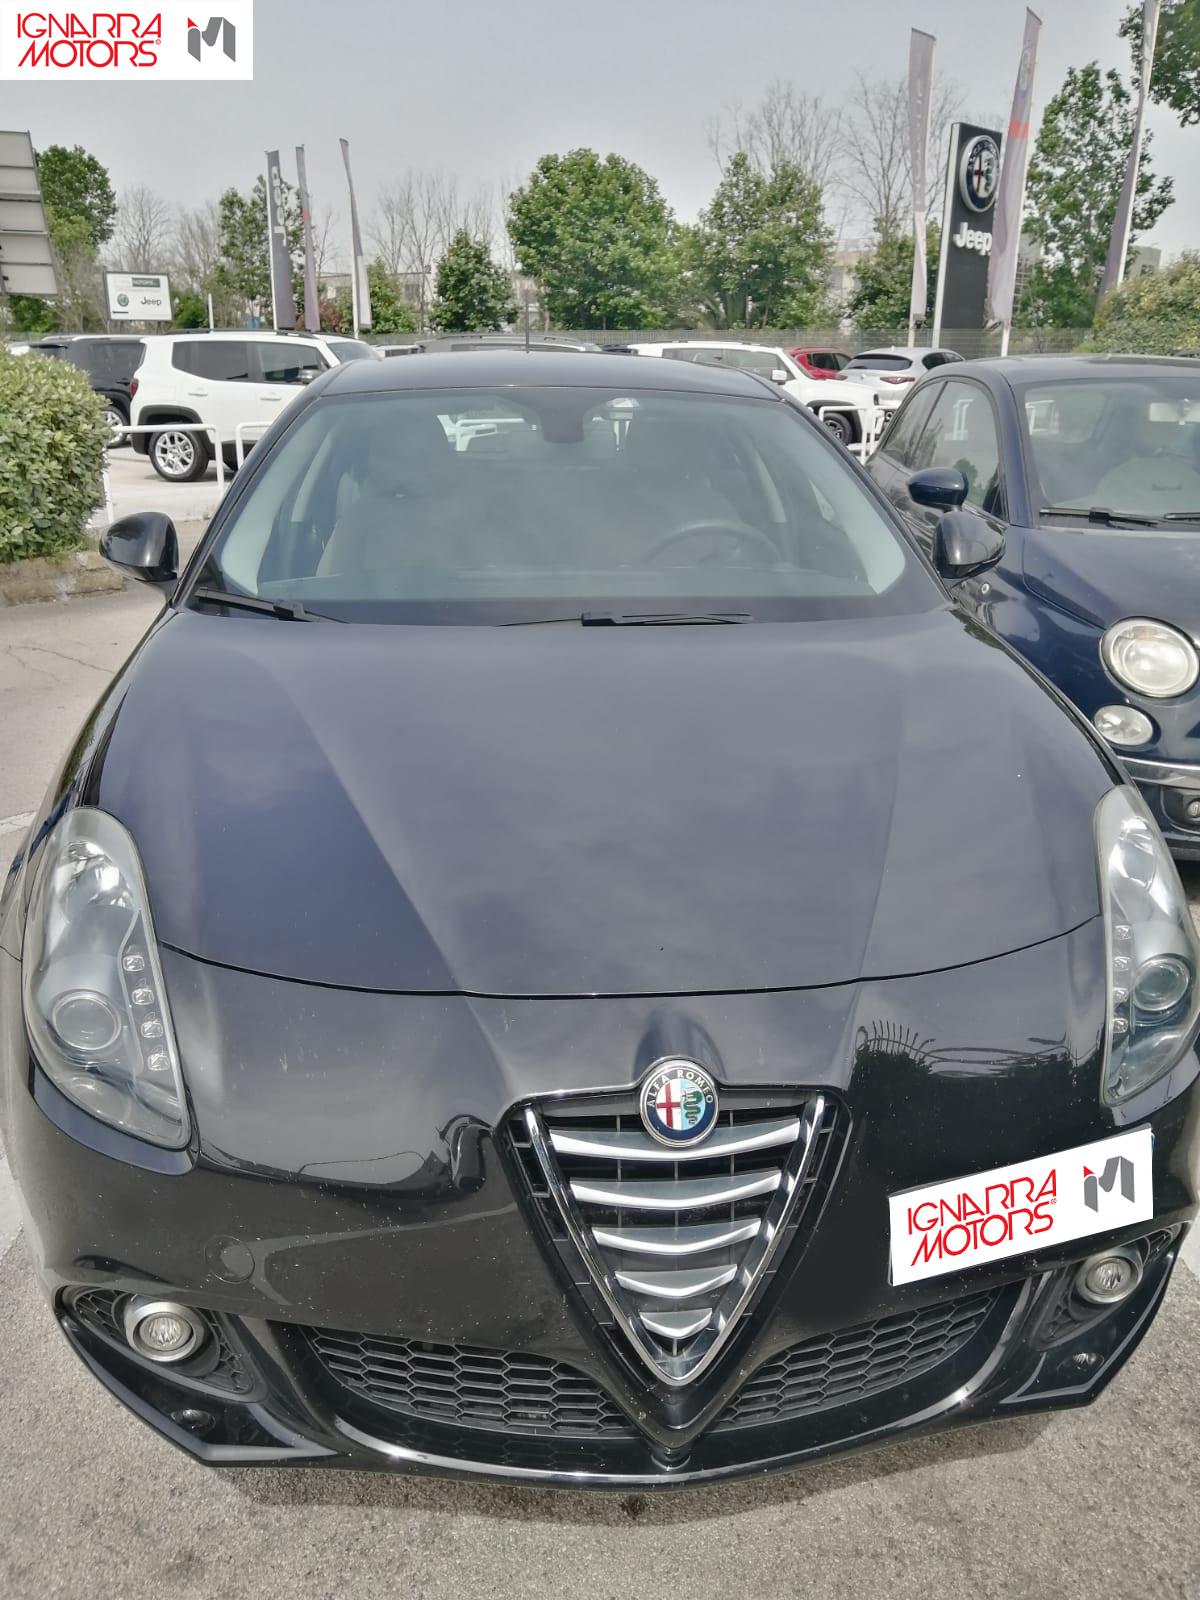 Alfa Romeo Giulietta 1.4 distintive 120 CV